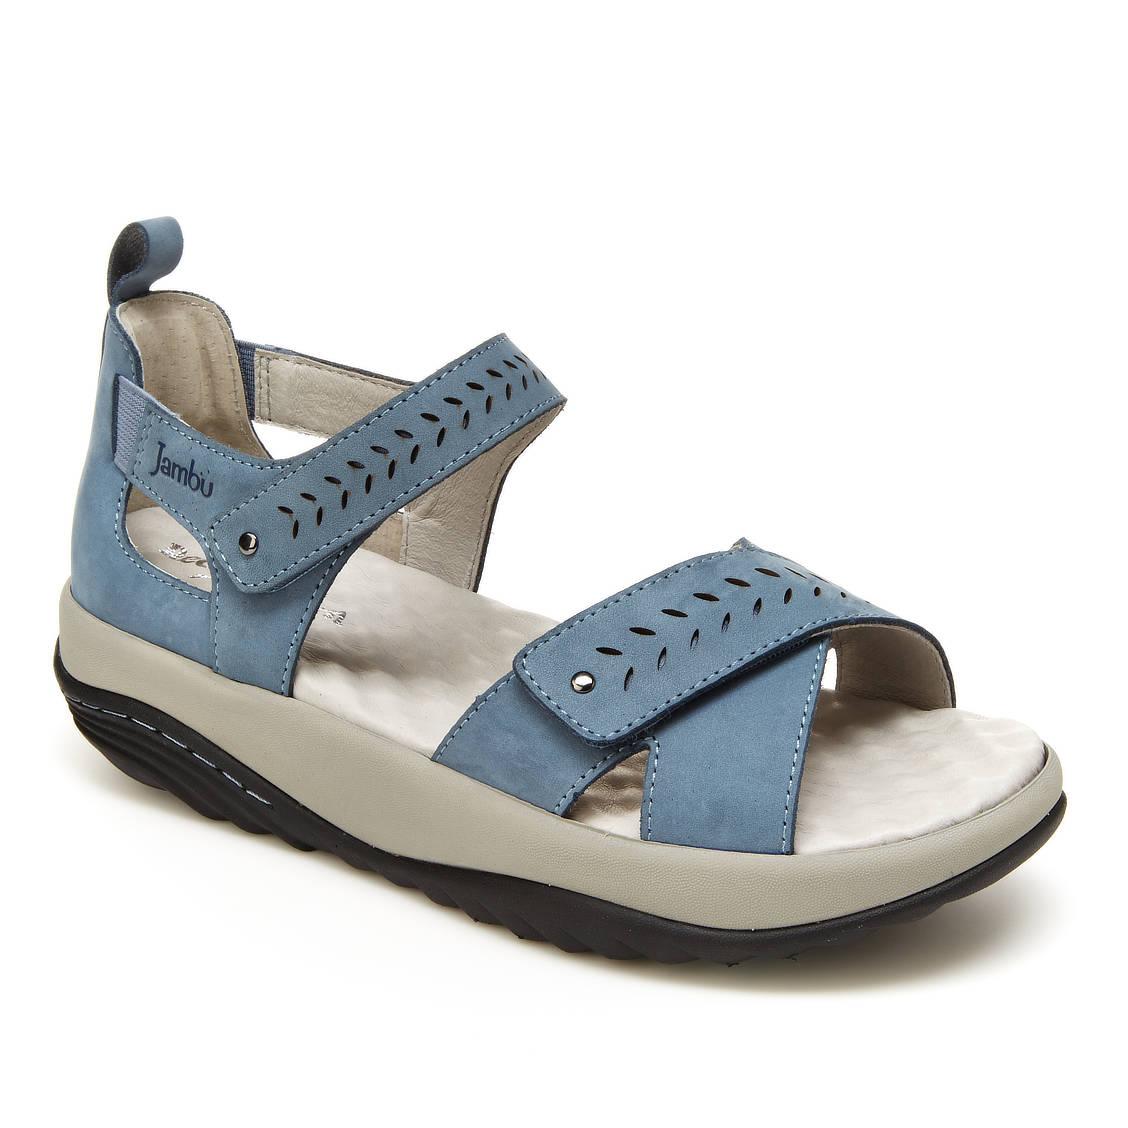 jambu-sedona-j1sed06-lt-blue-1